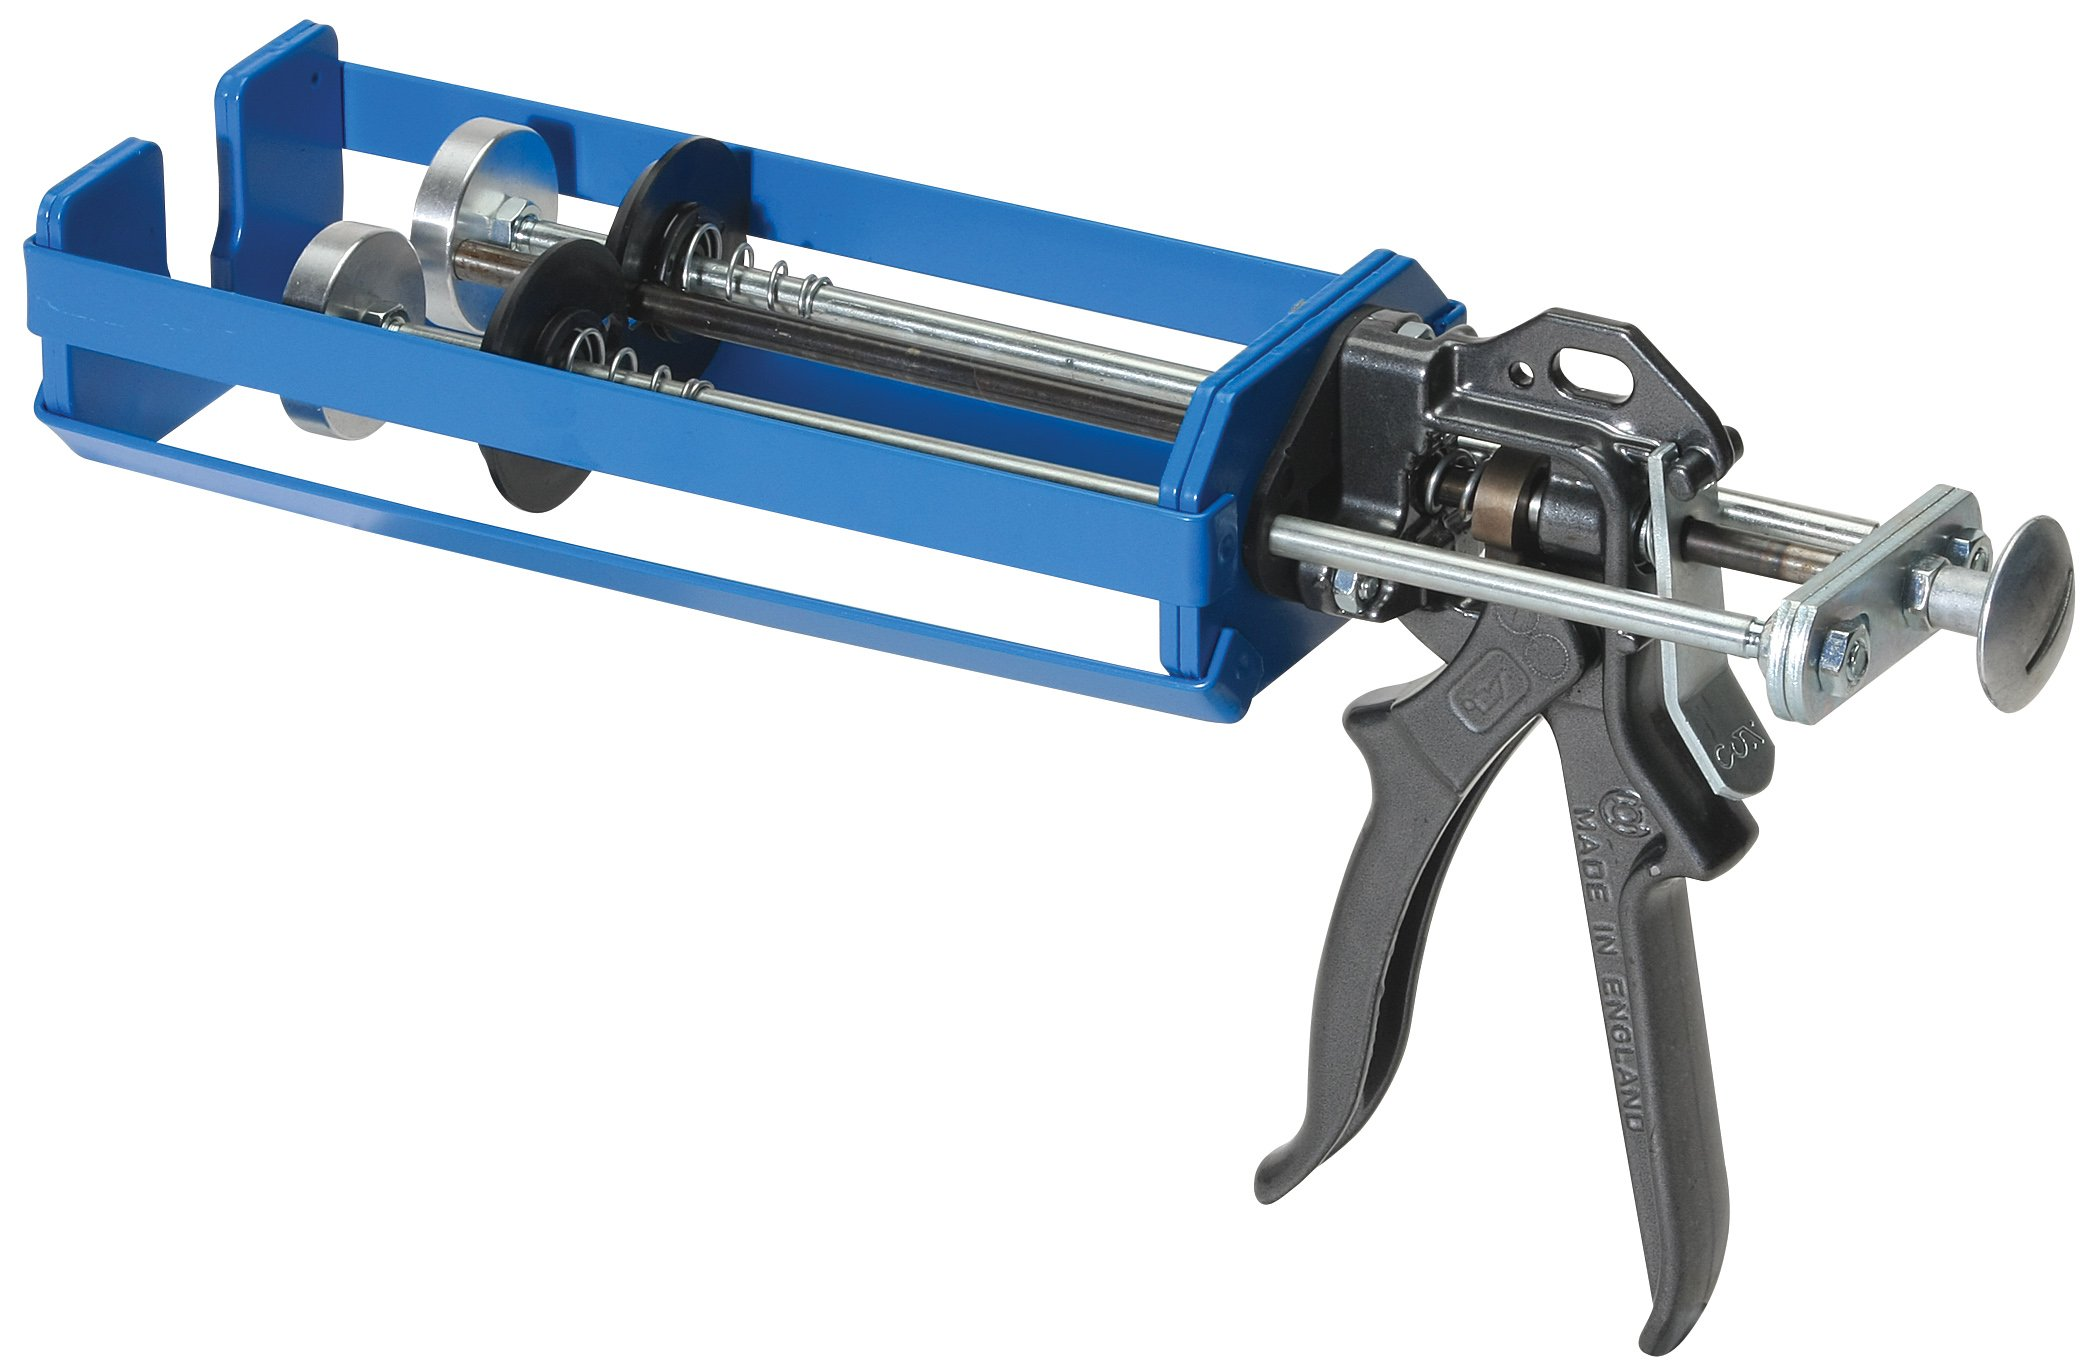 COX M300X 300 ml. x 300 ml. Cartridge High Viscosity Manual Epoxy Applicator